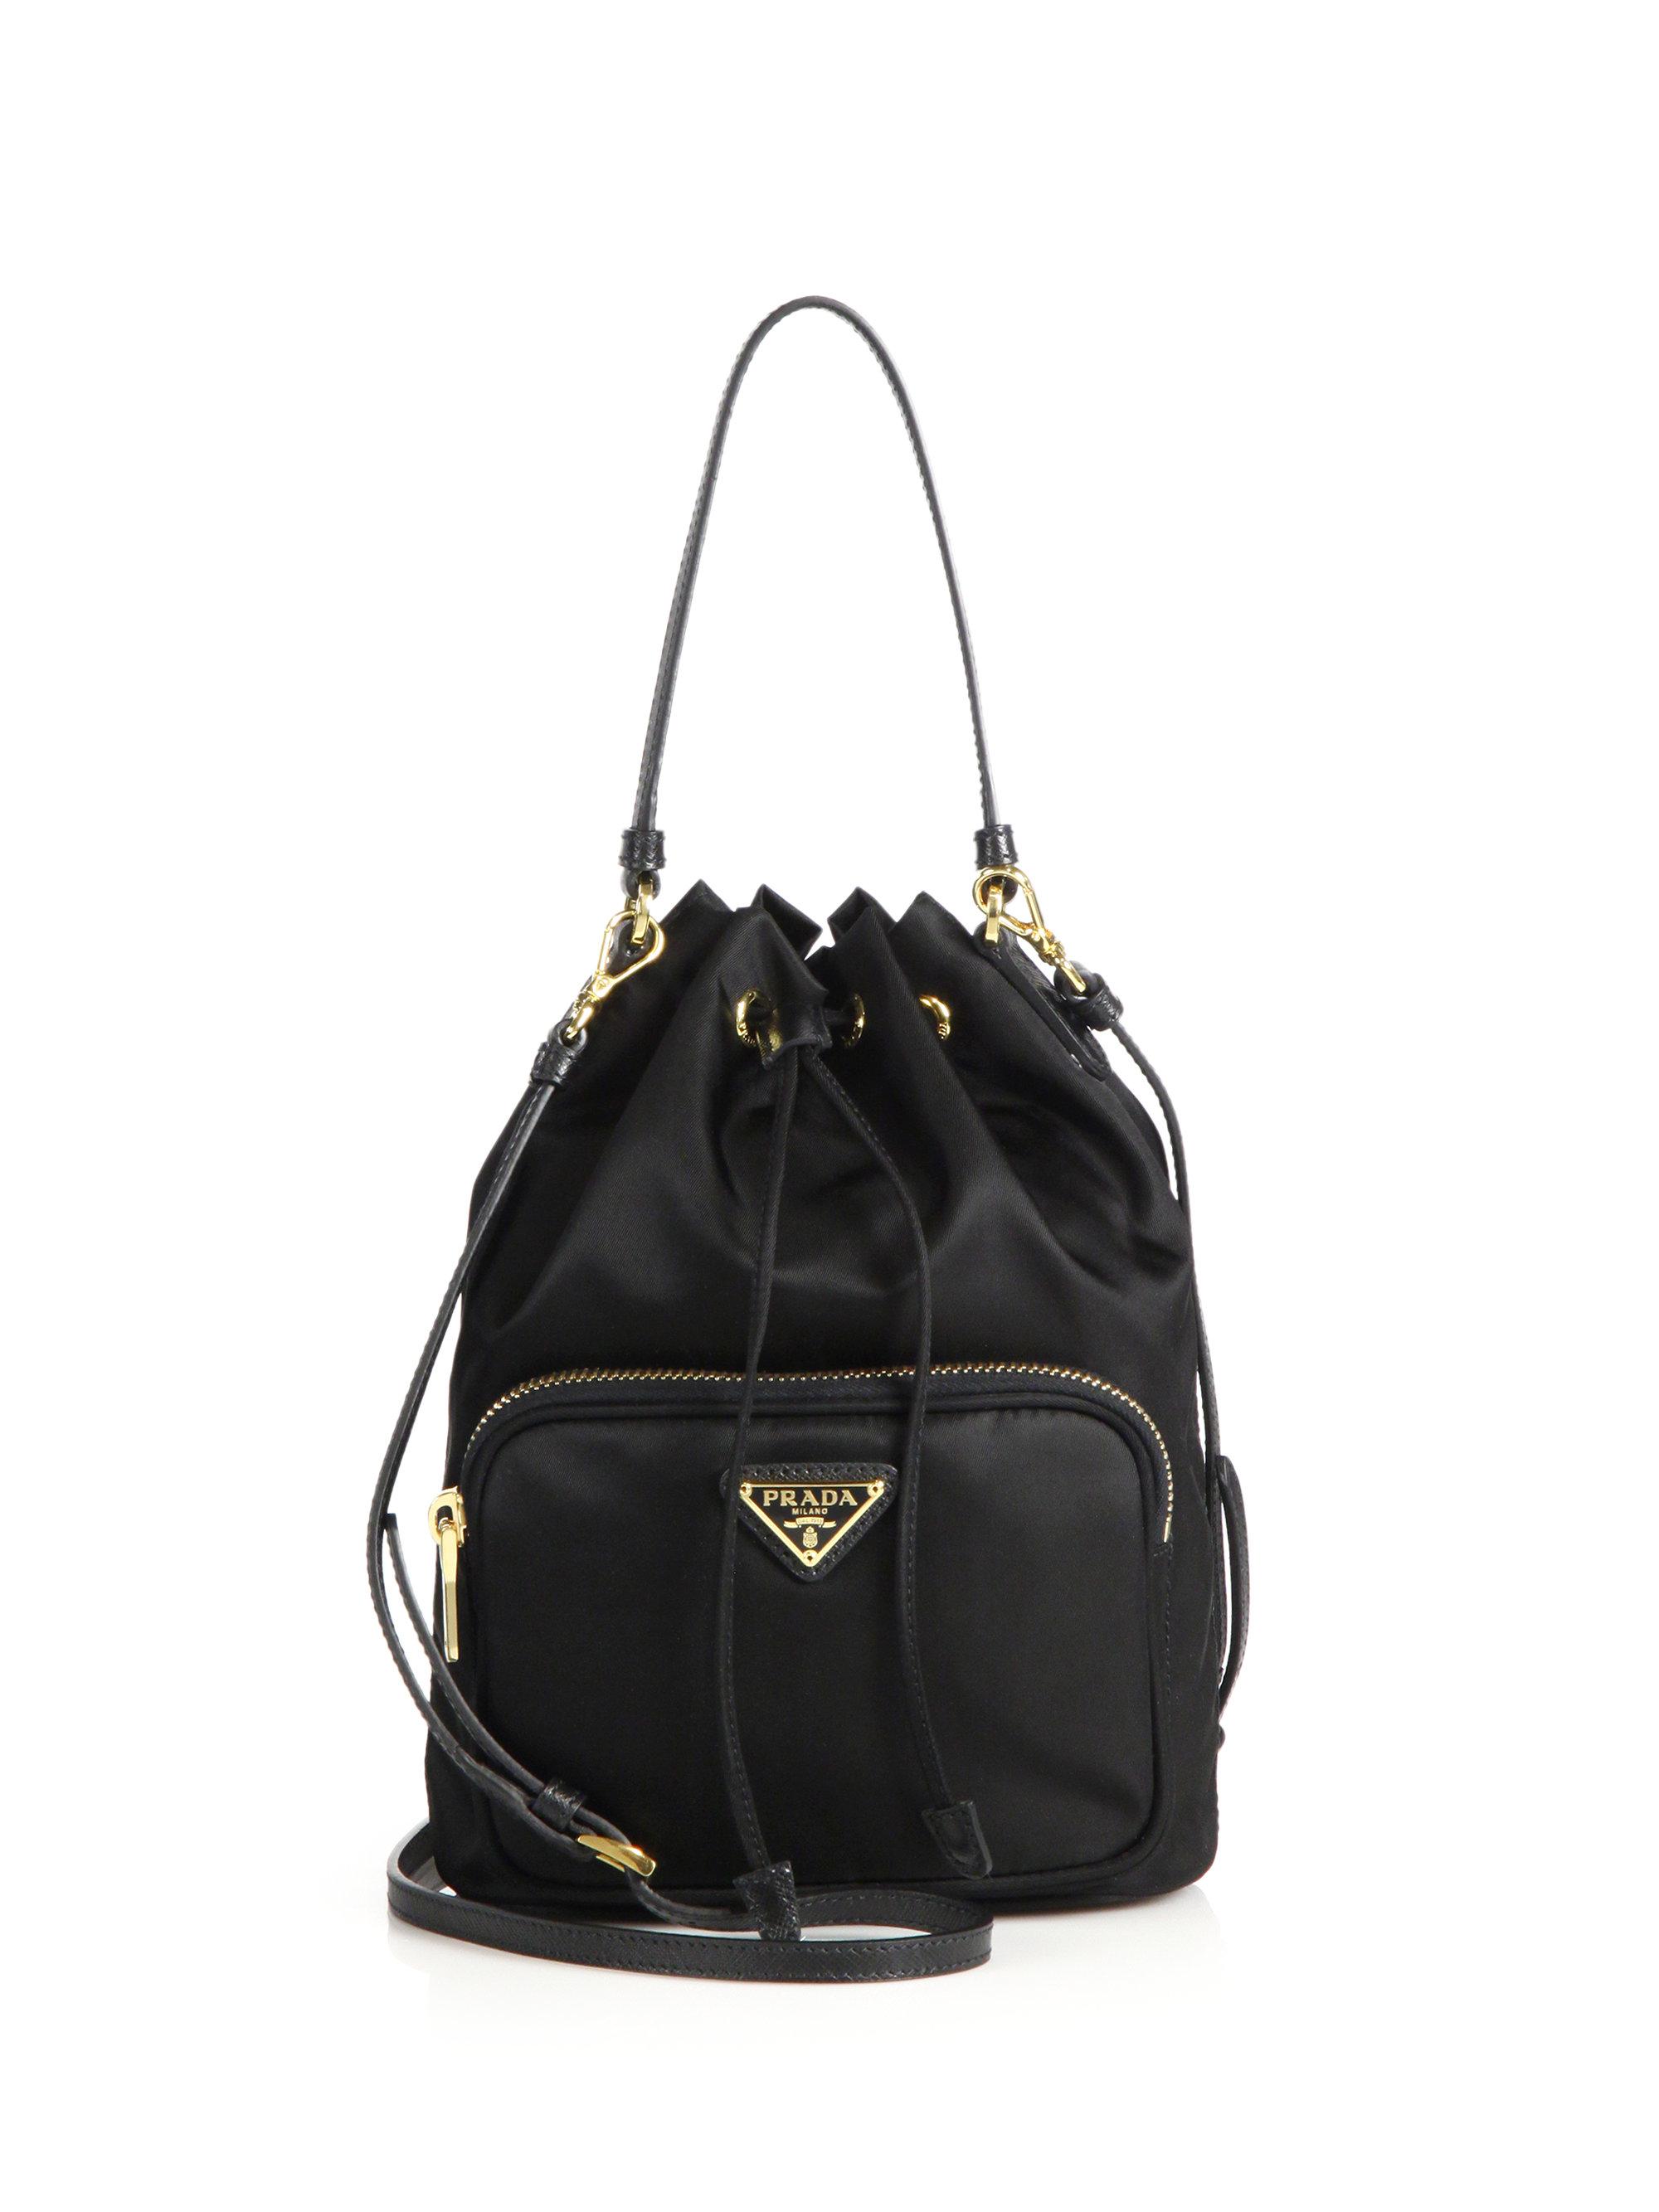 860a49fac5f7 ... coupon lyst prada mini nylon leather bucket bag in black b013c bc7f2 ...